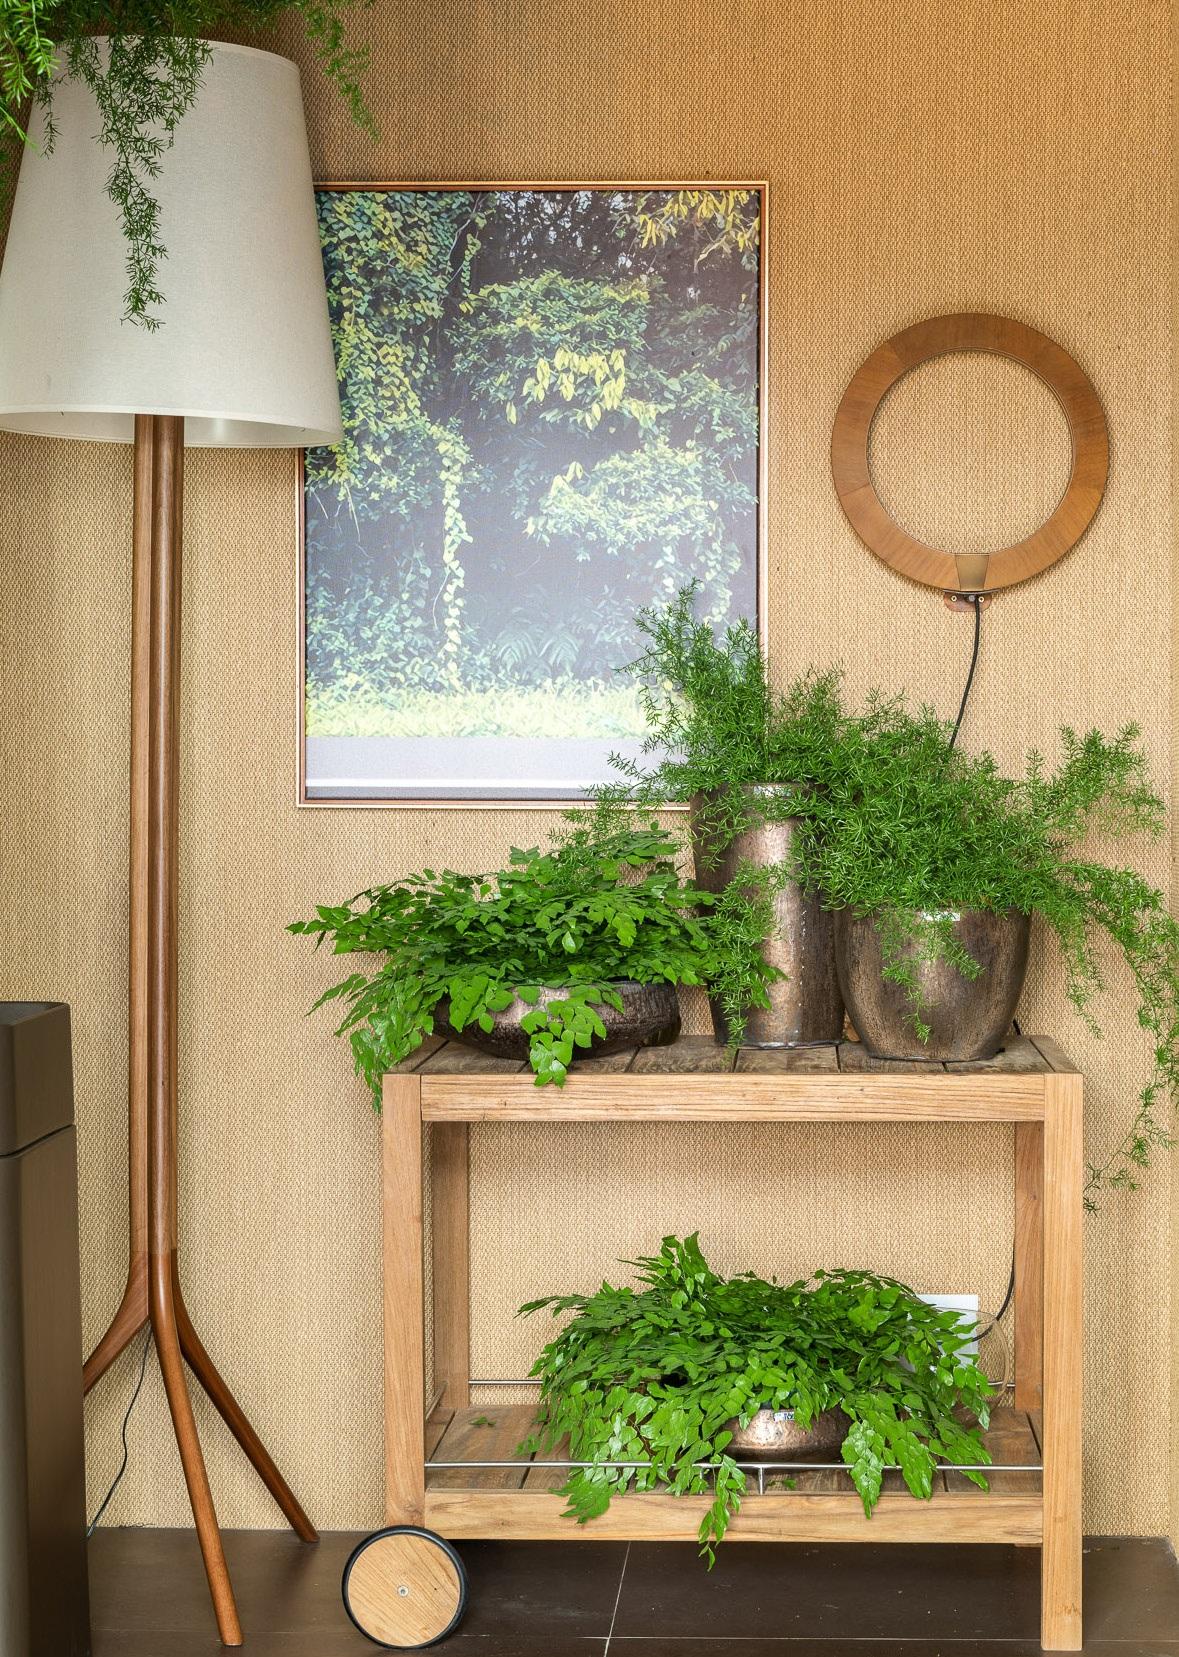 Jardim no banheiro feito de vasos - Cortez Meyer - CASACOR